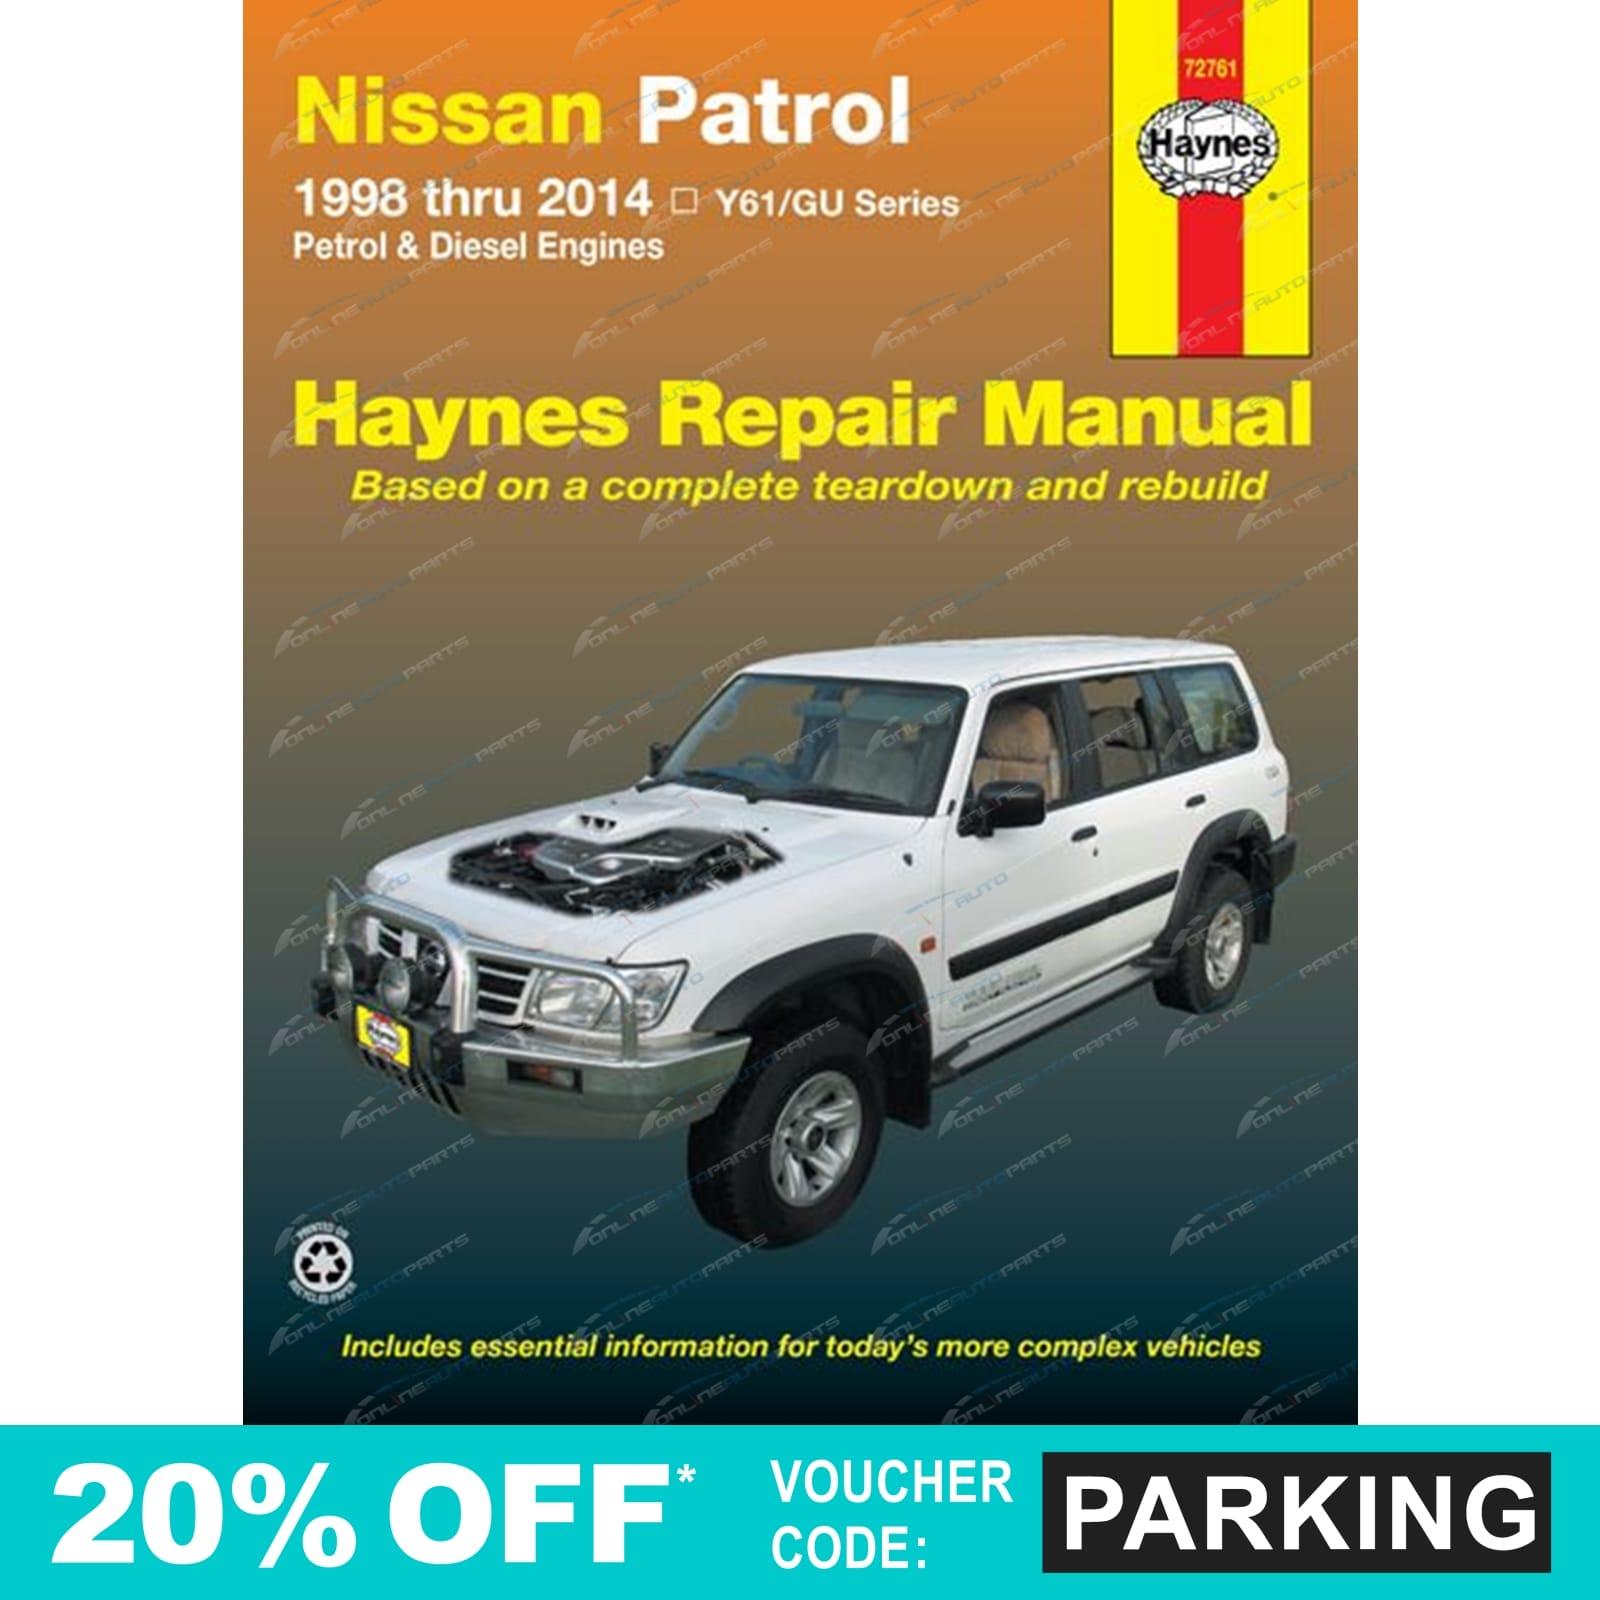 haynes car repair manual book for nissan patrol gu y61 1997 2014 rh ebay com electronic service manual nissan patrol y61 pdf electronic service manual nissan patrol y61 pdf